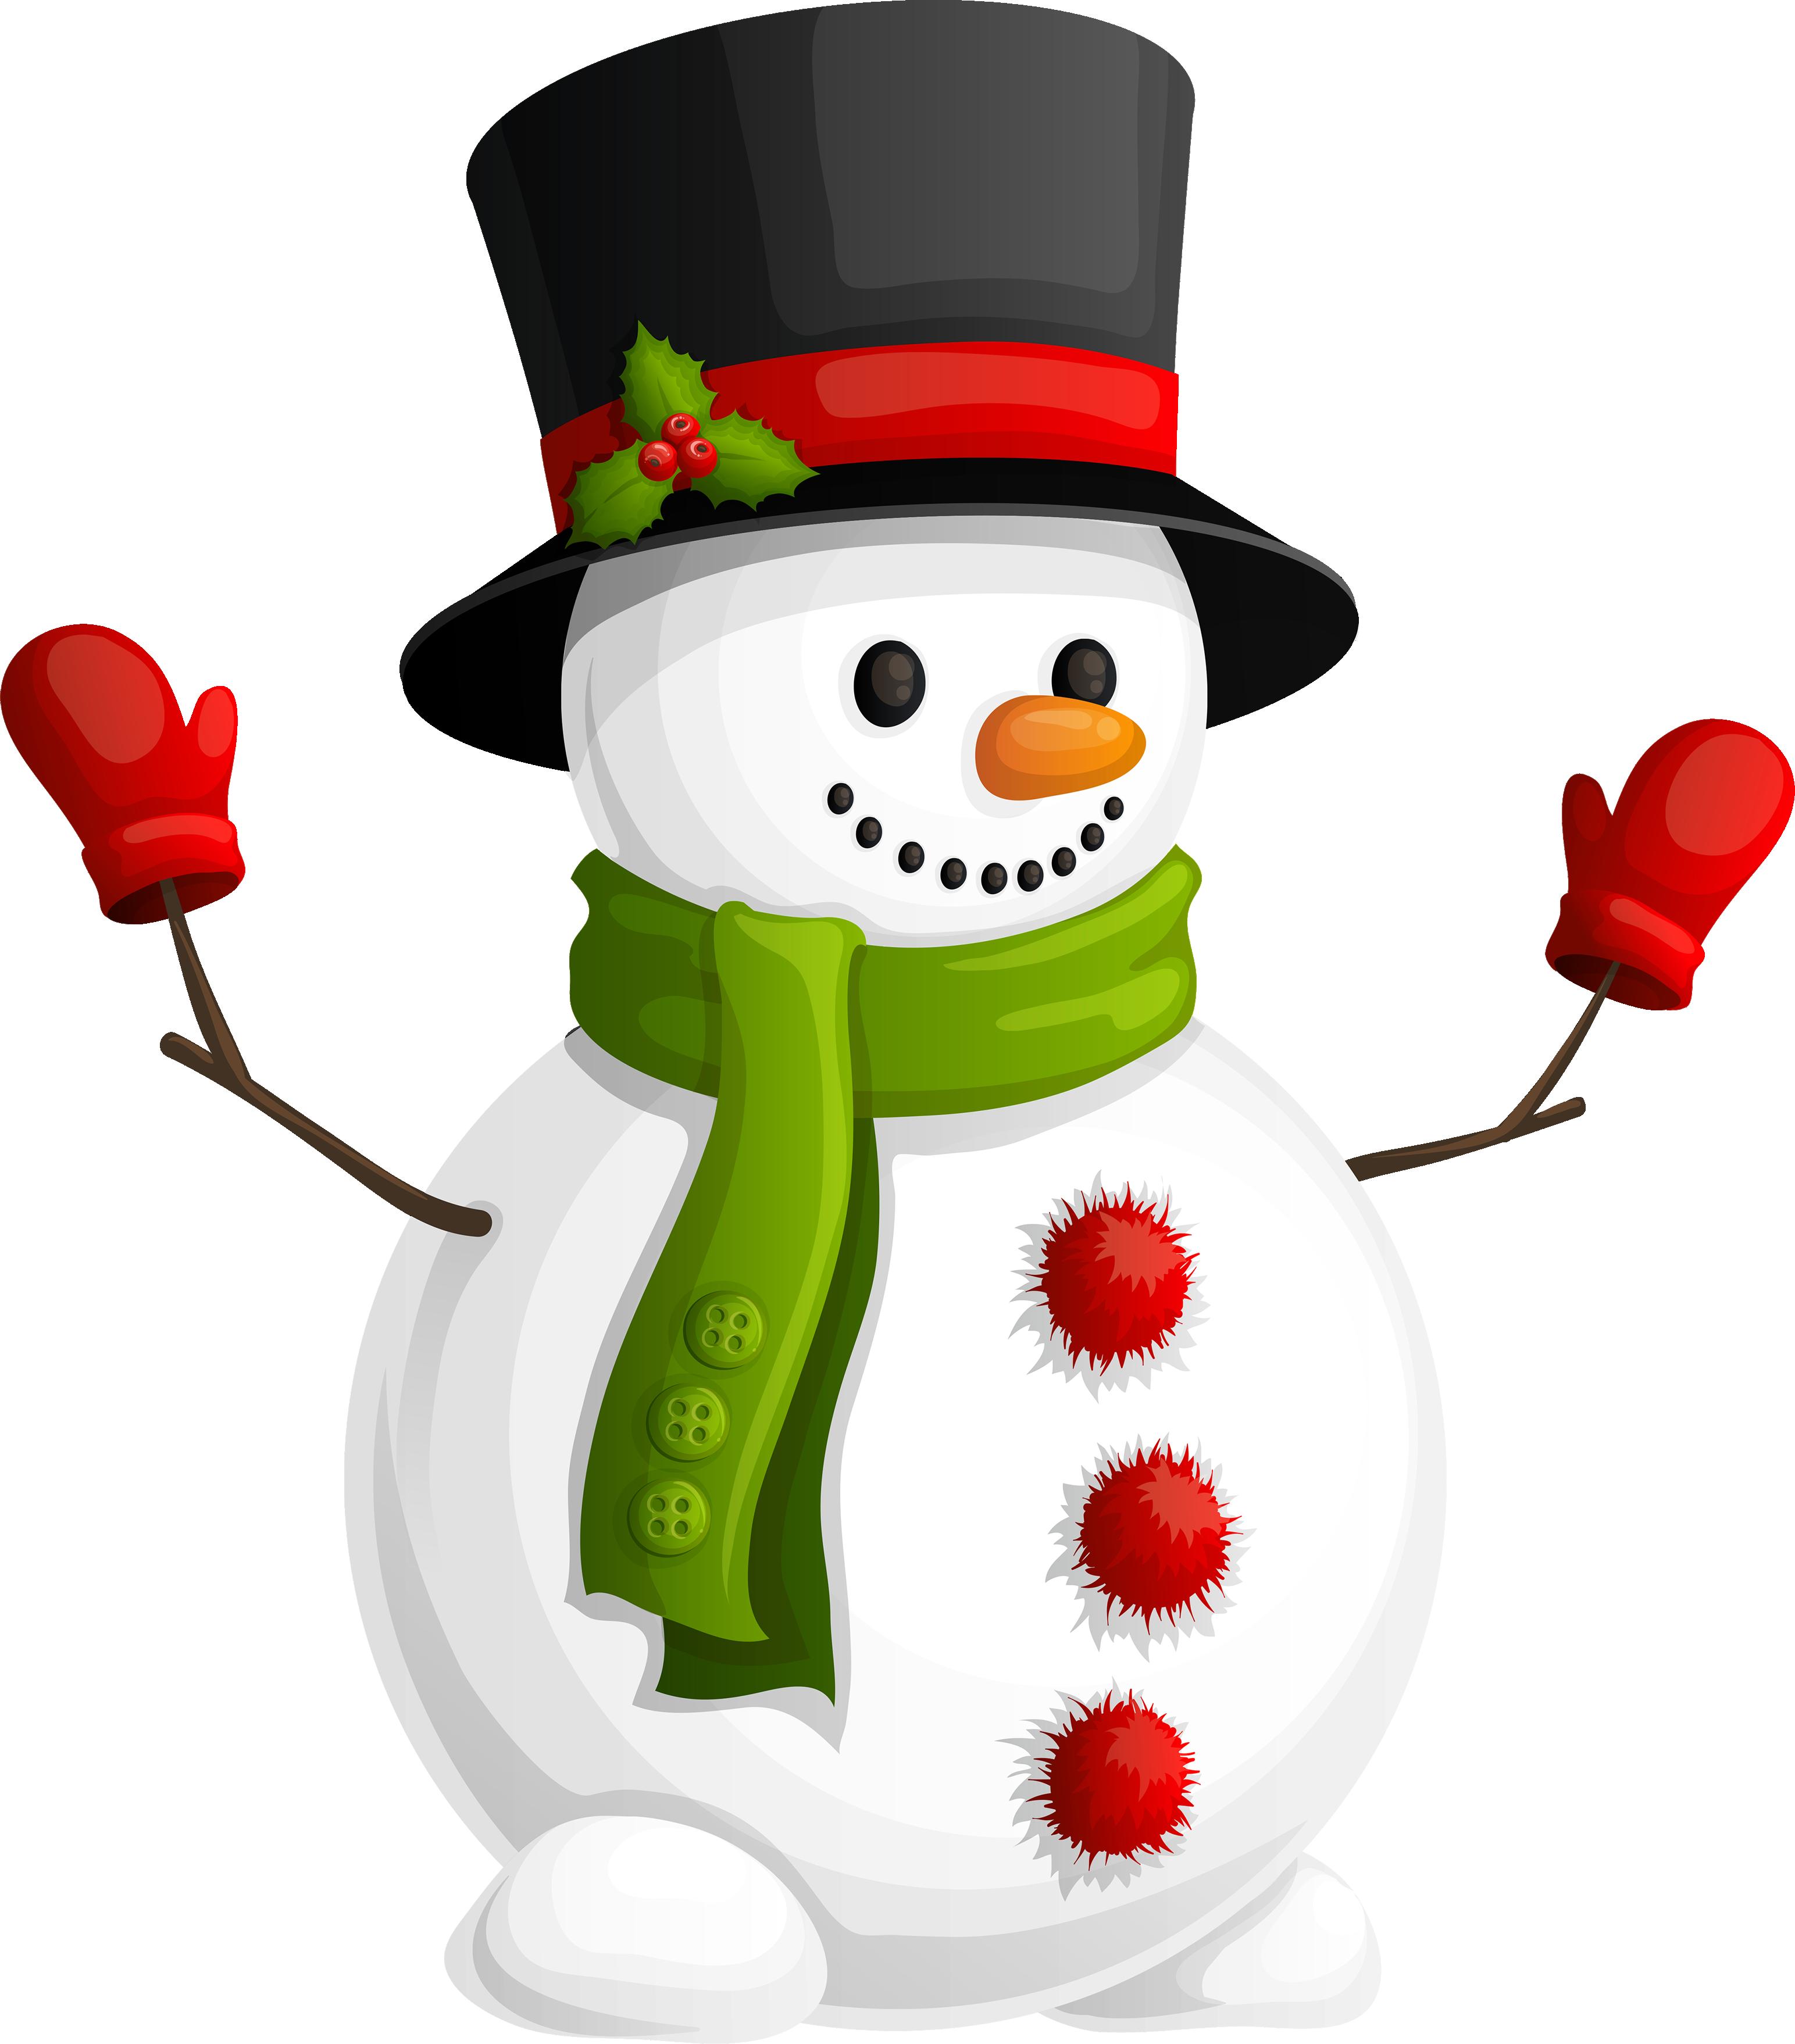 Png image cliparts pinterest. Clipart pumpkin snowman